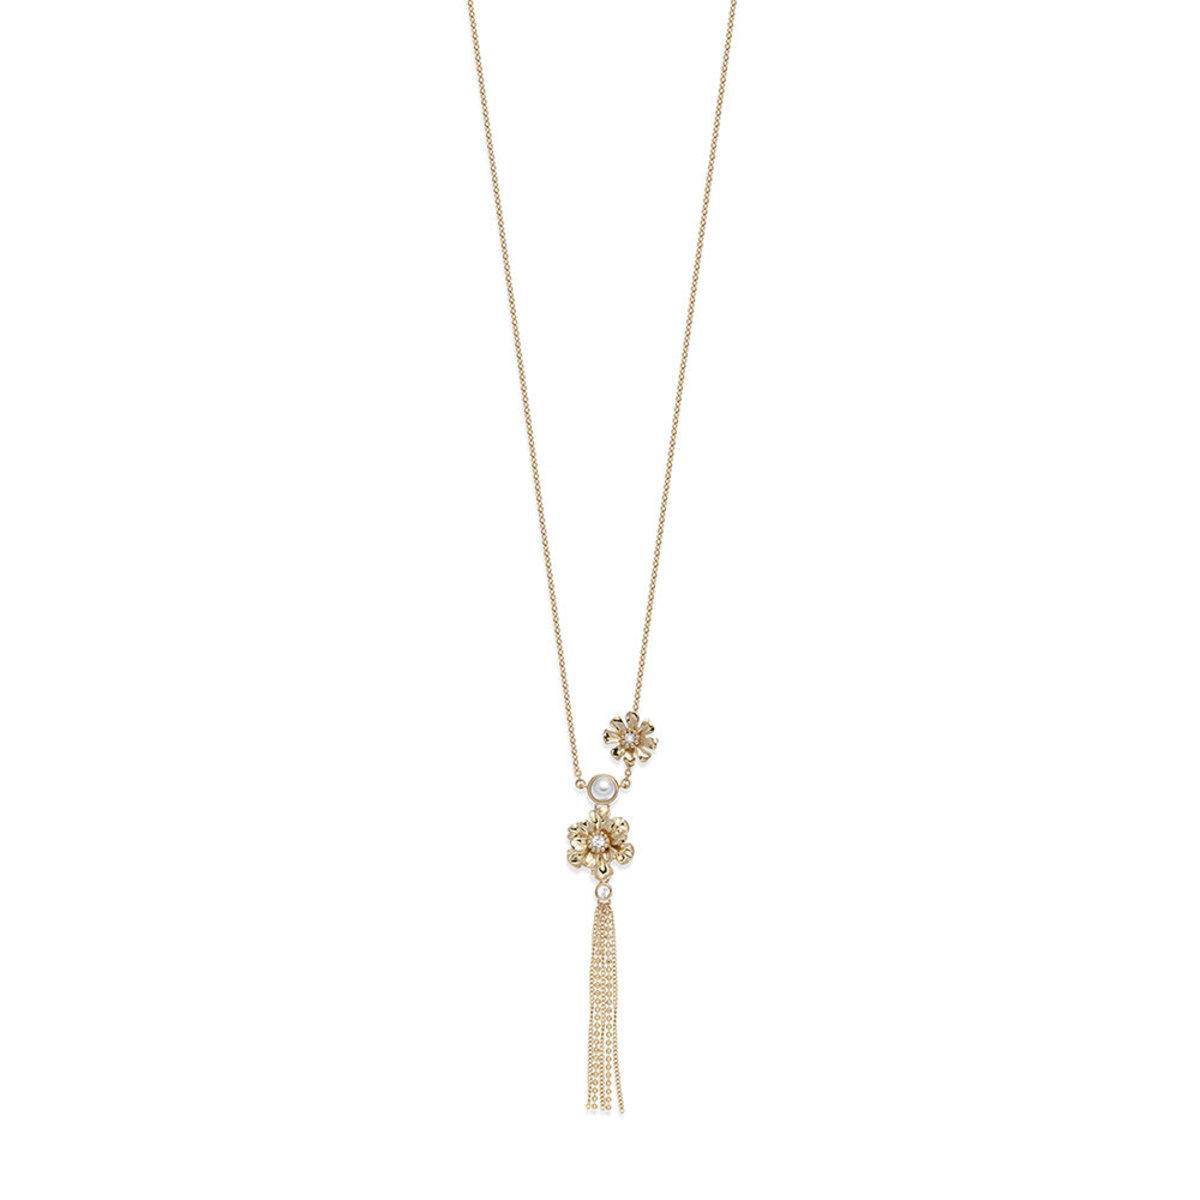 Lush Blossom: gold plating, Swarovski crystal, Swarovski pearl, flower pendant necklace